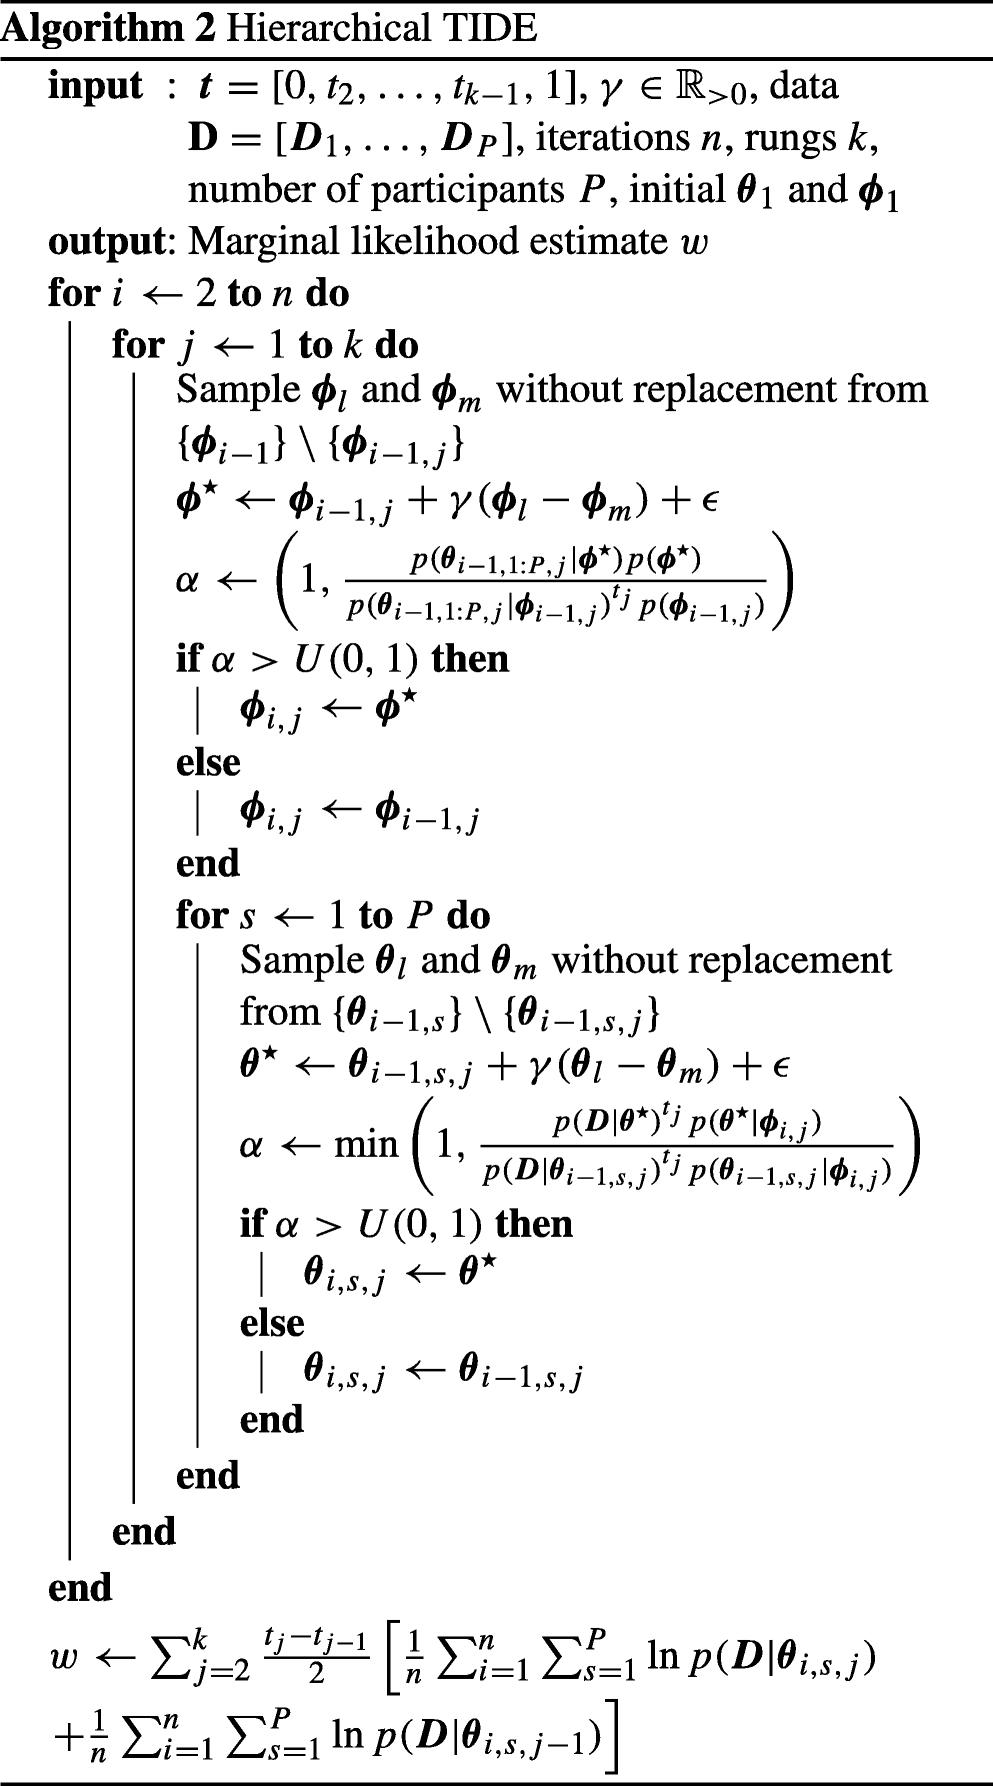 Thermodynamic integration via differential evolution: A